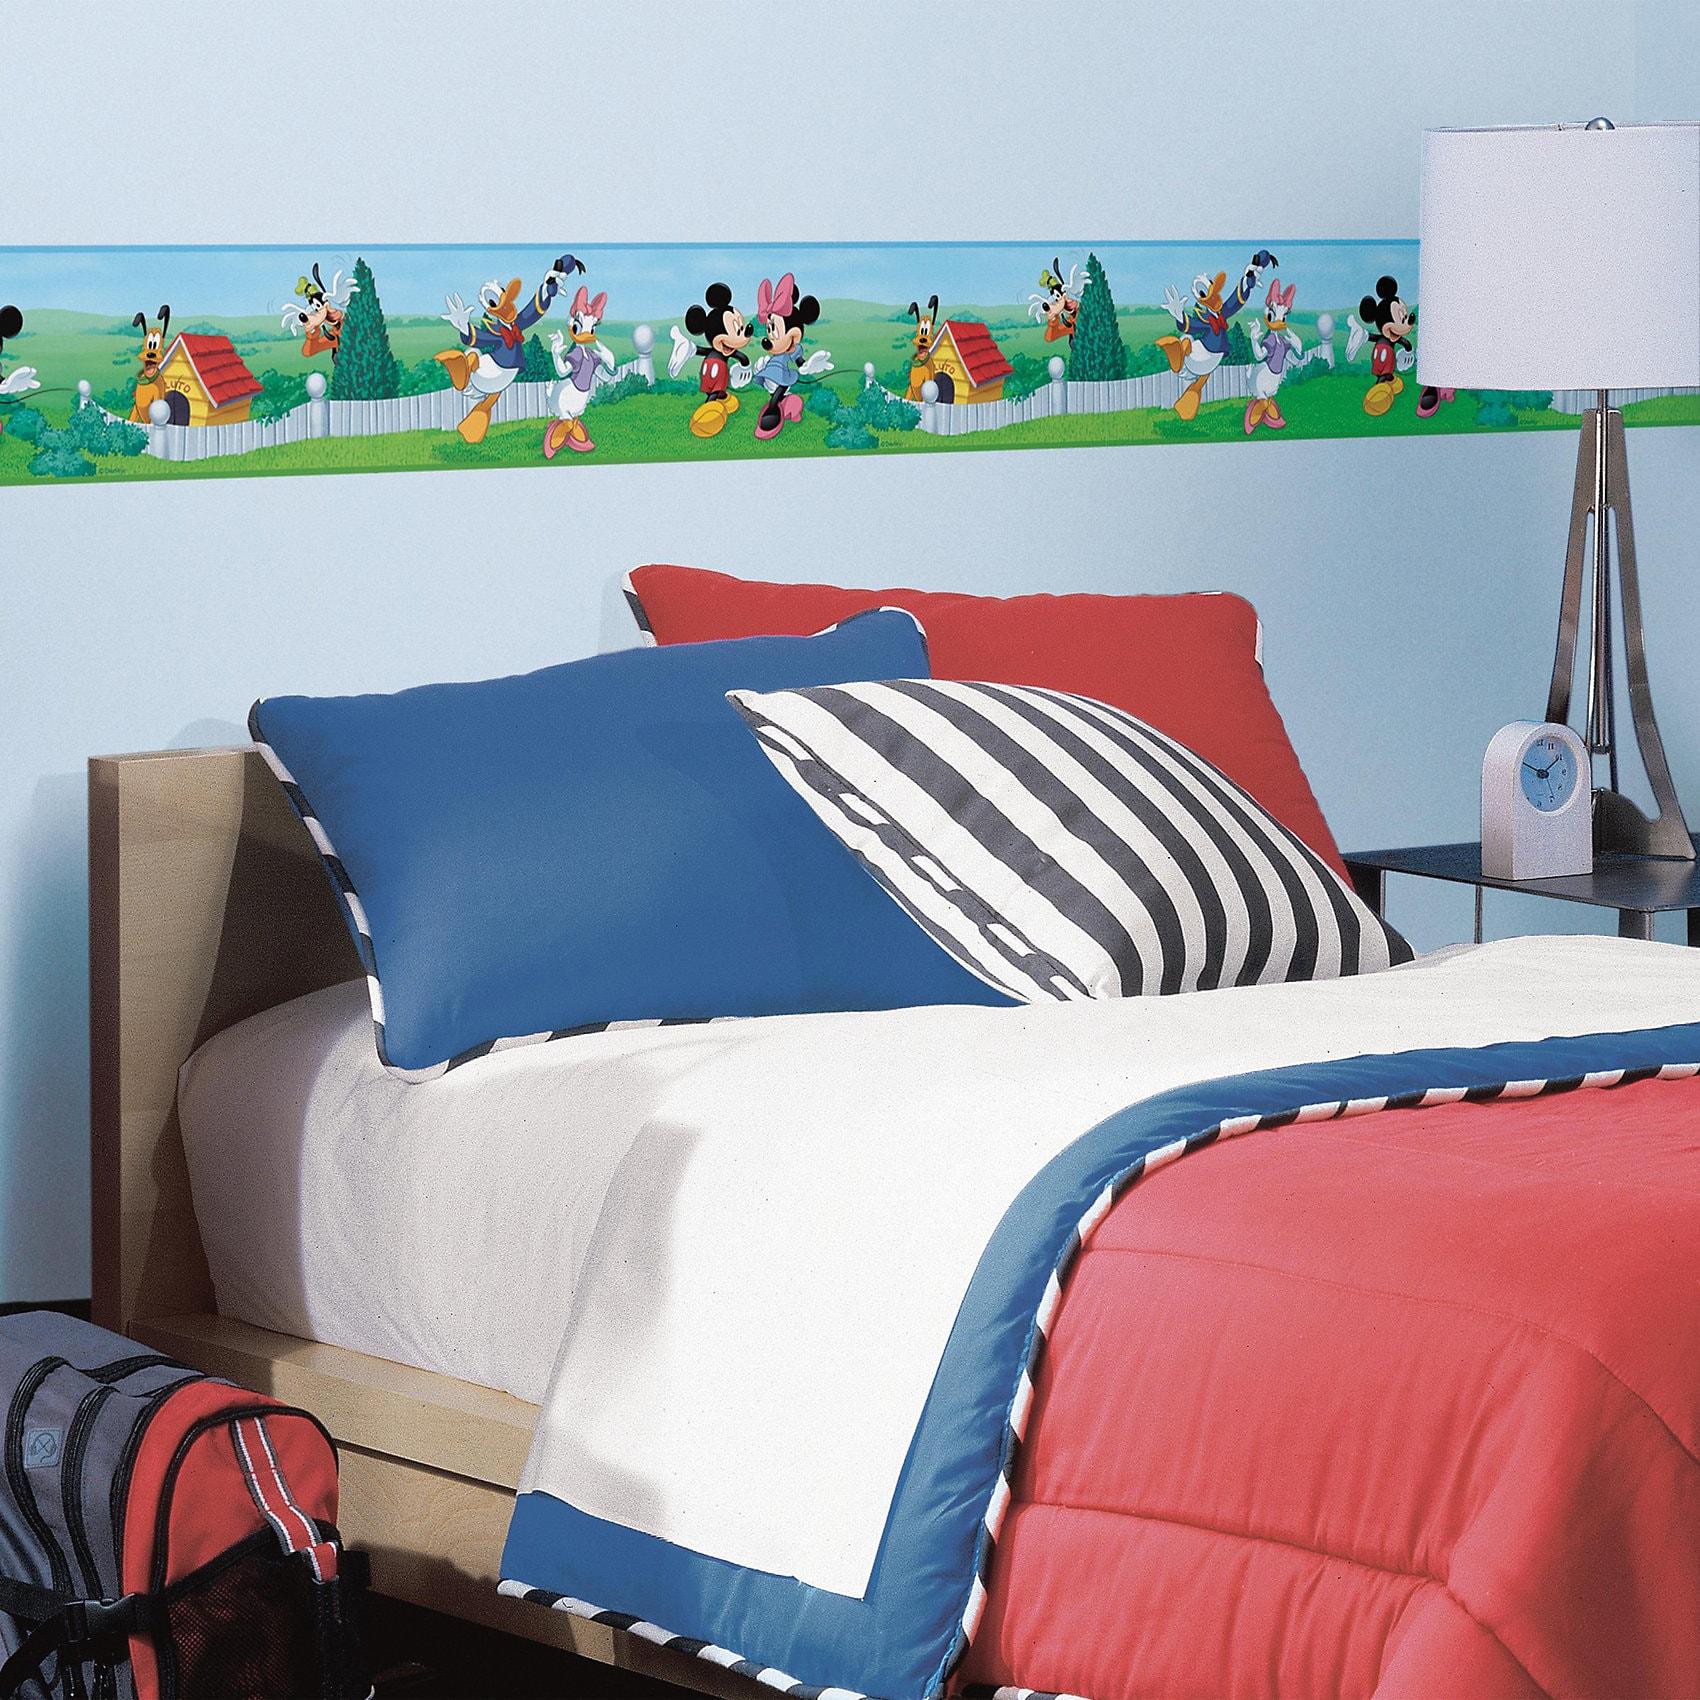 RoomMates Wandsticker Mickey & Friends Border 1-tlg.